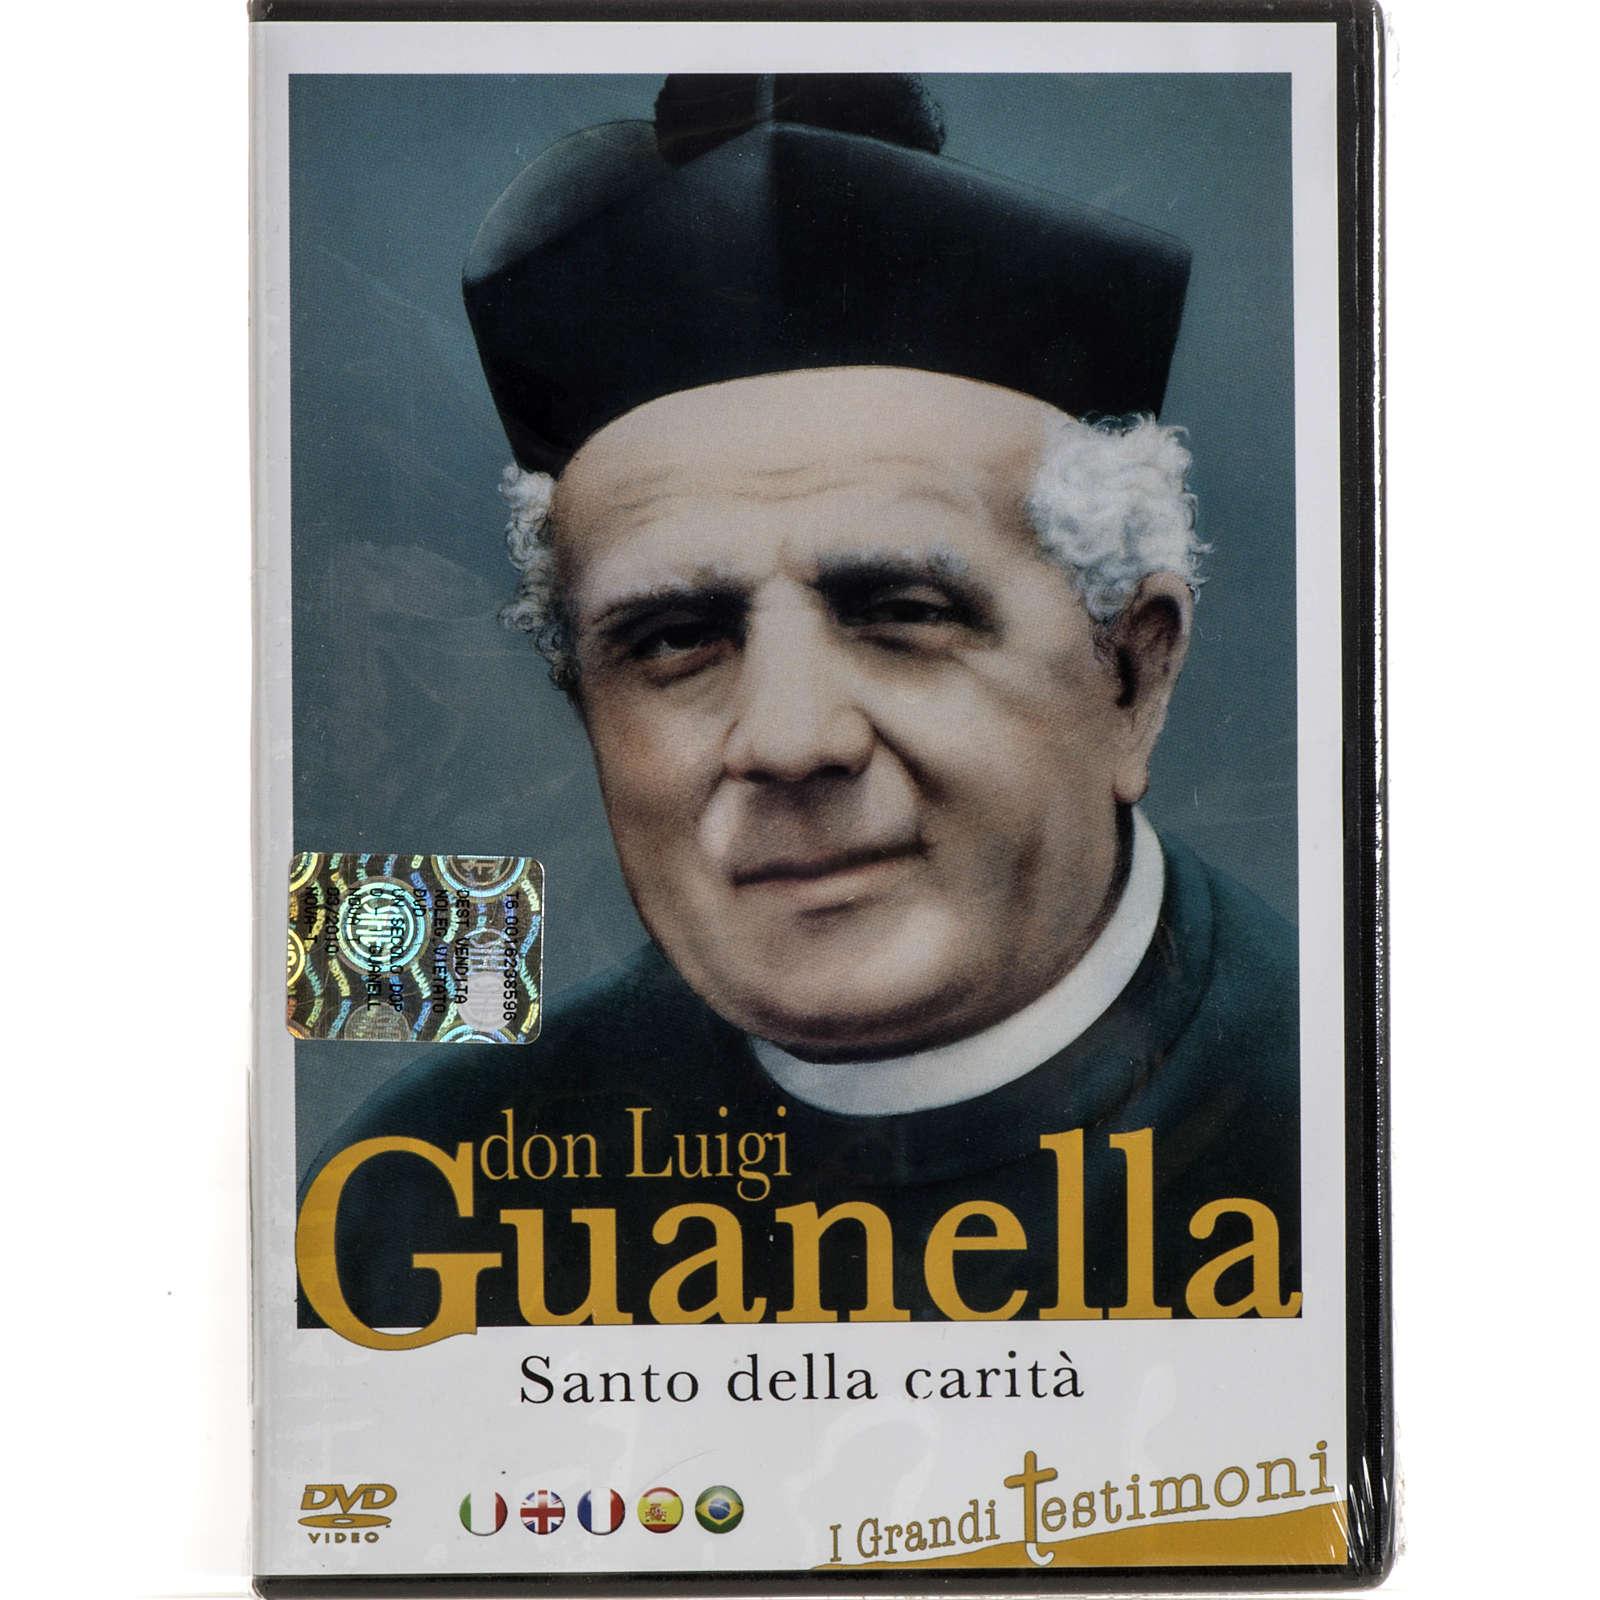 Don Luigi Guanella - Saint of Charity 3